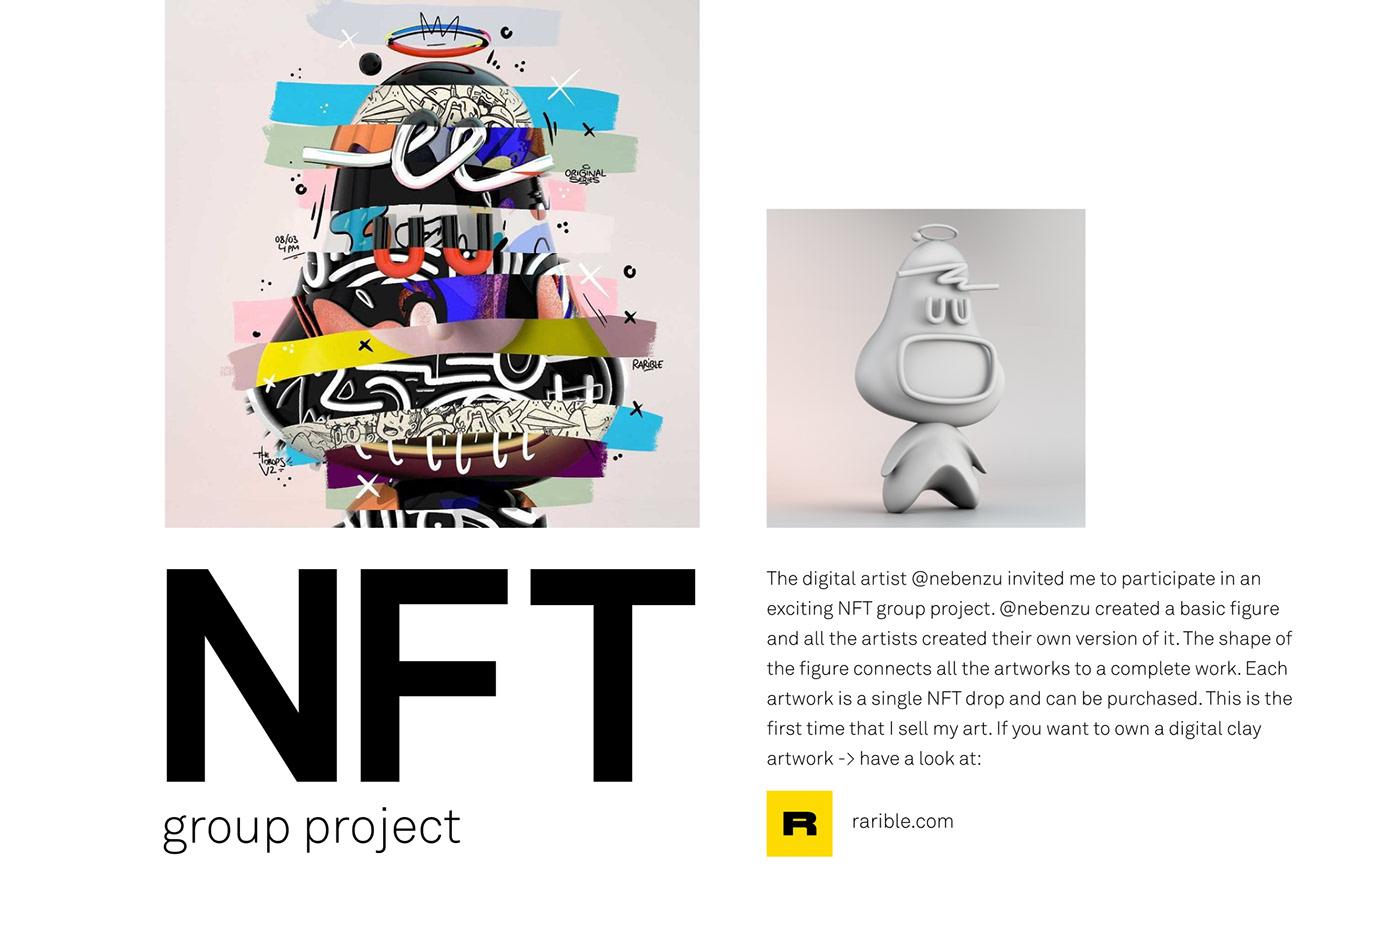 3D Character characterdesign clay clayart Digital Art  ILLUSTRATION  ntf NTF art rarible